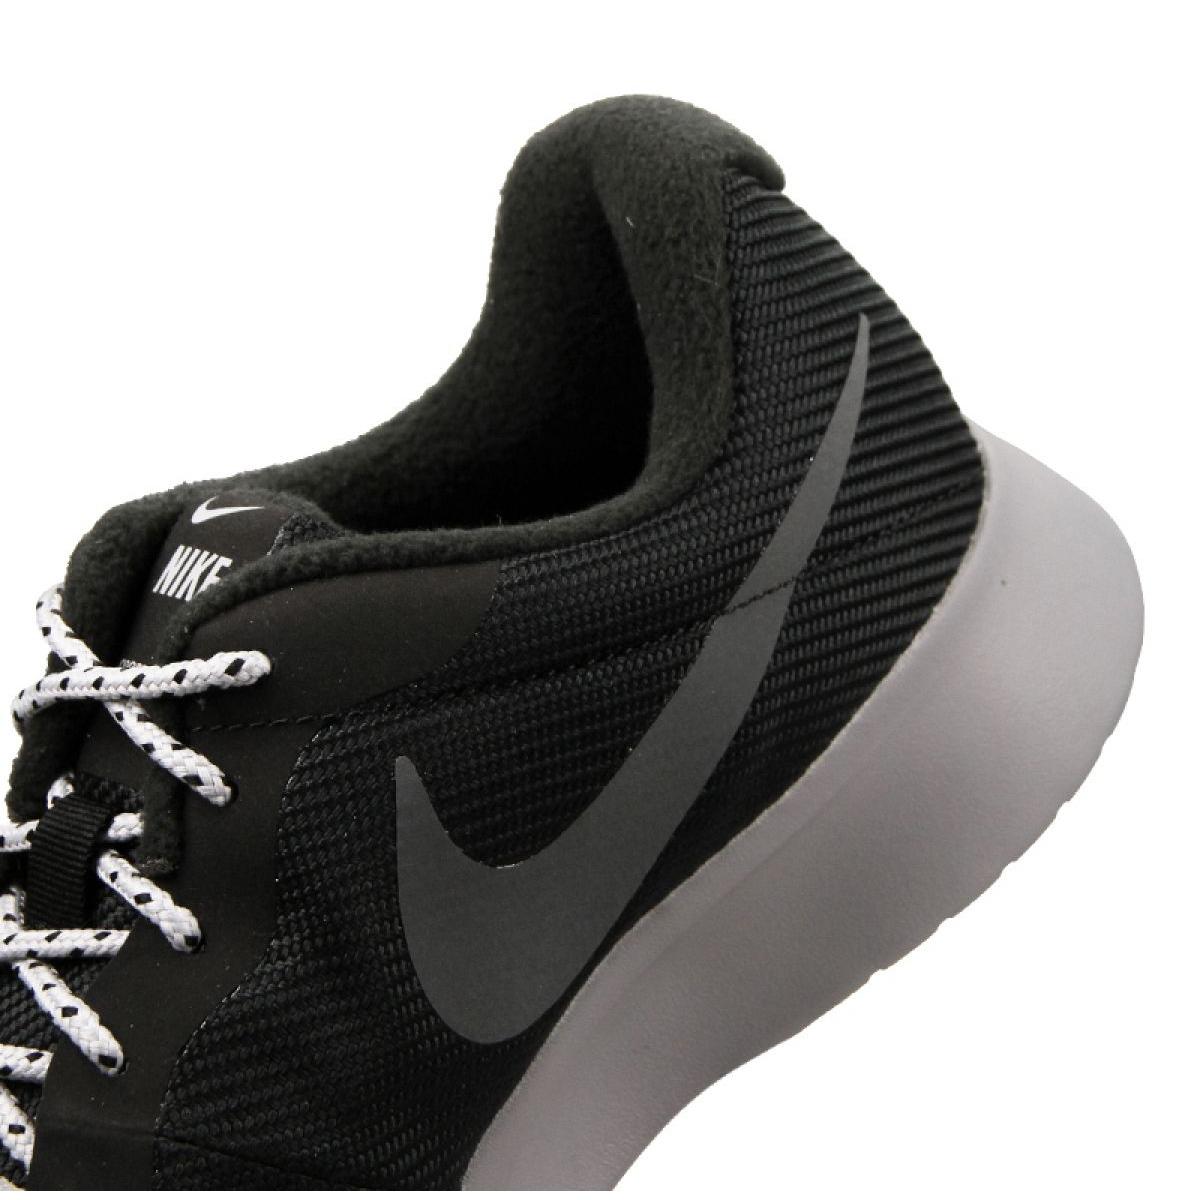 Zapatillas Nike Tanjun Se M AR1941 005 negro